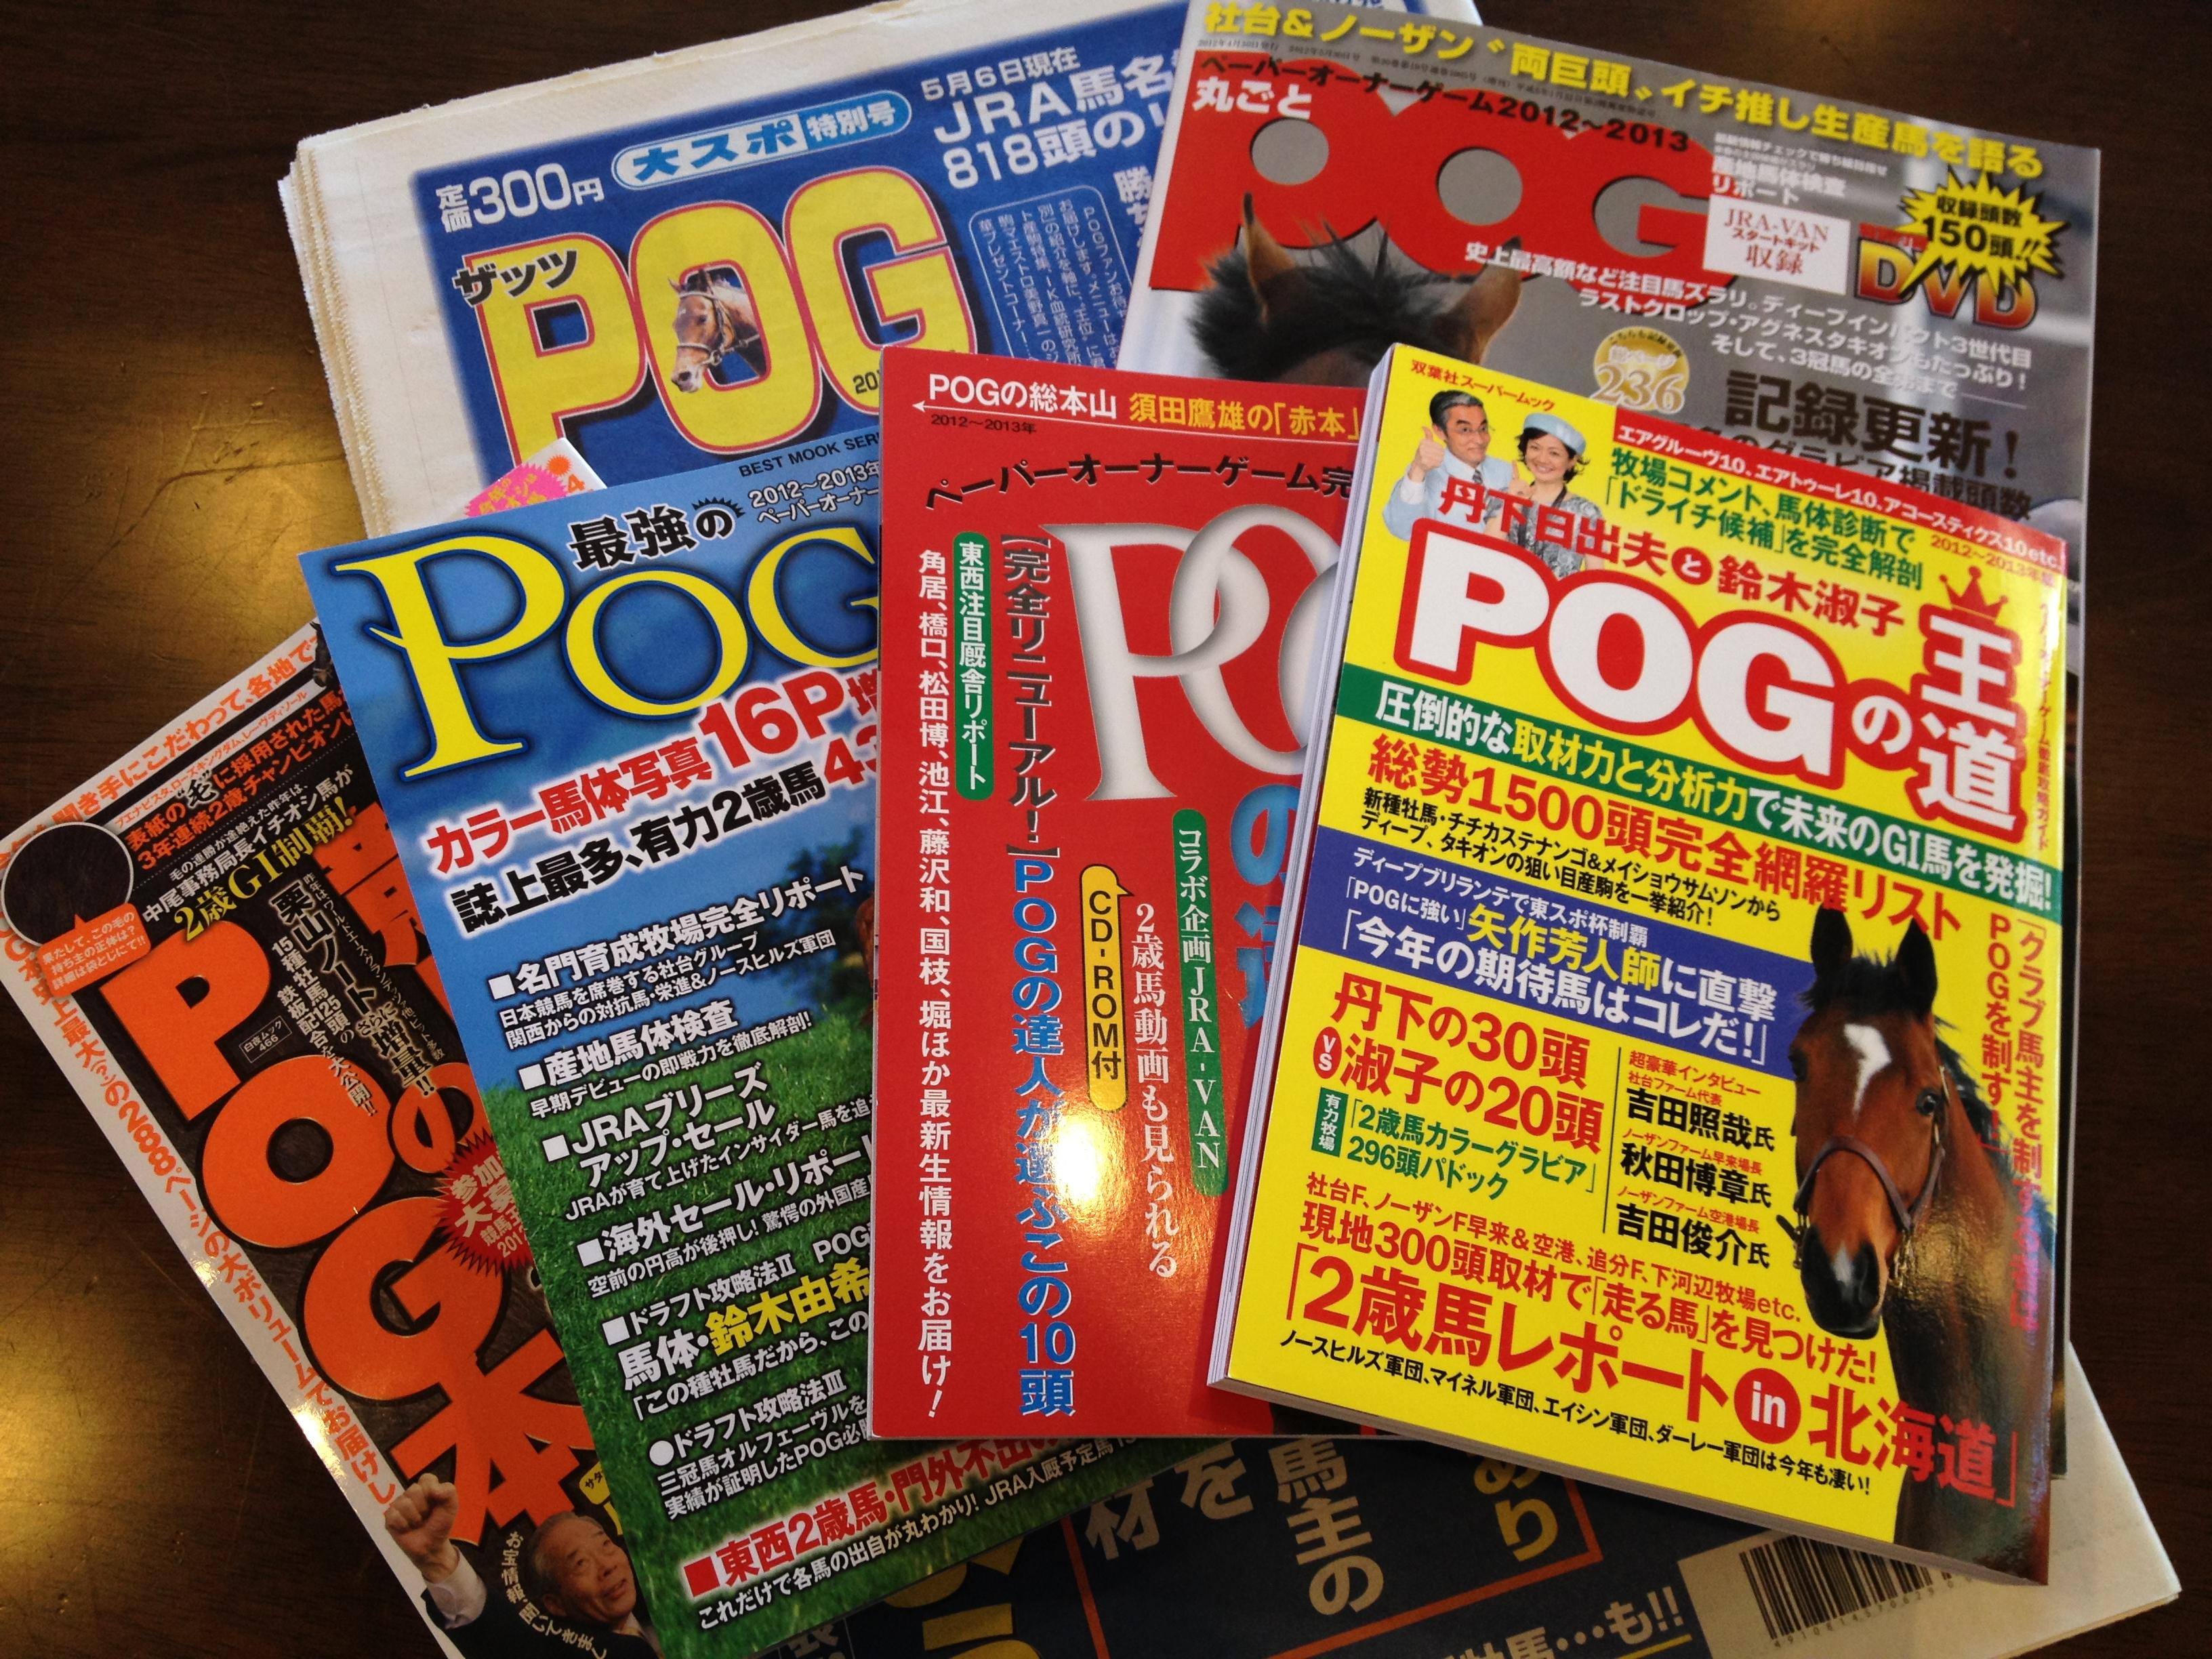 pogbooks2012-2013.JPG